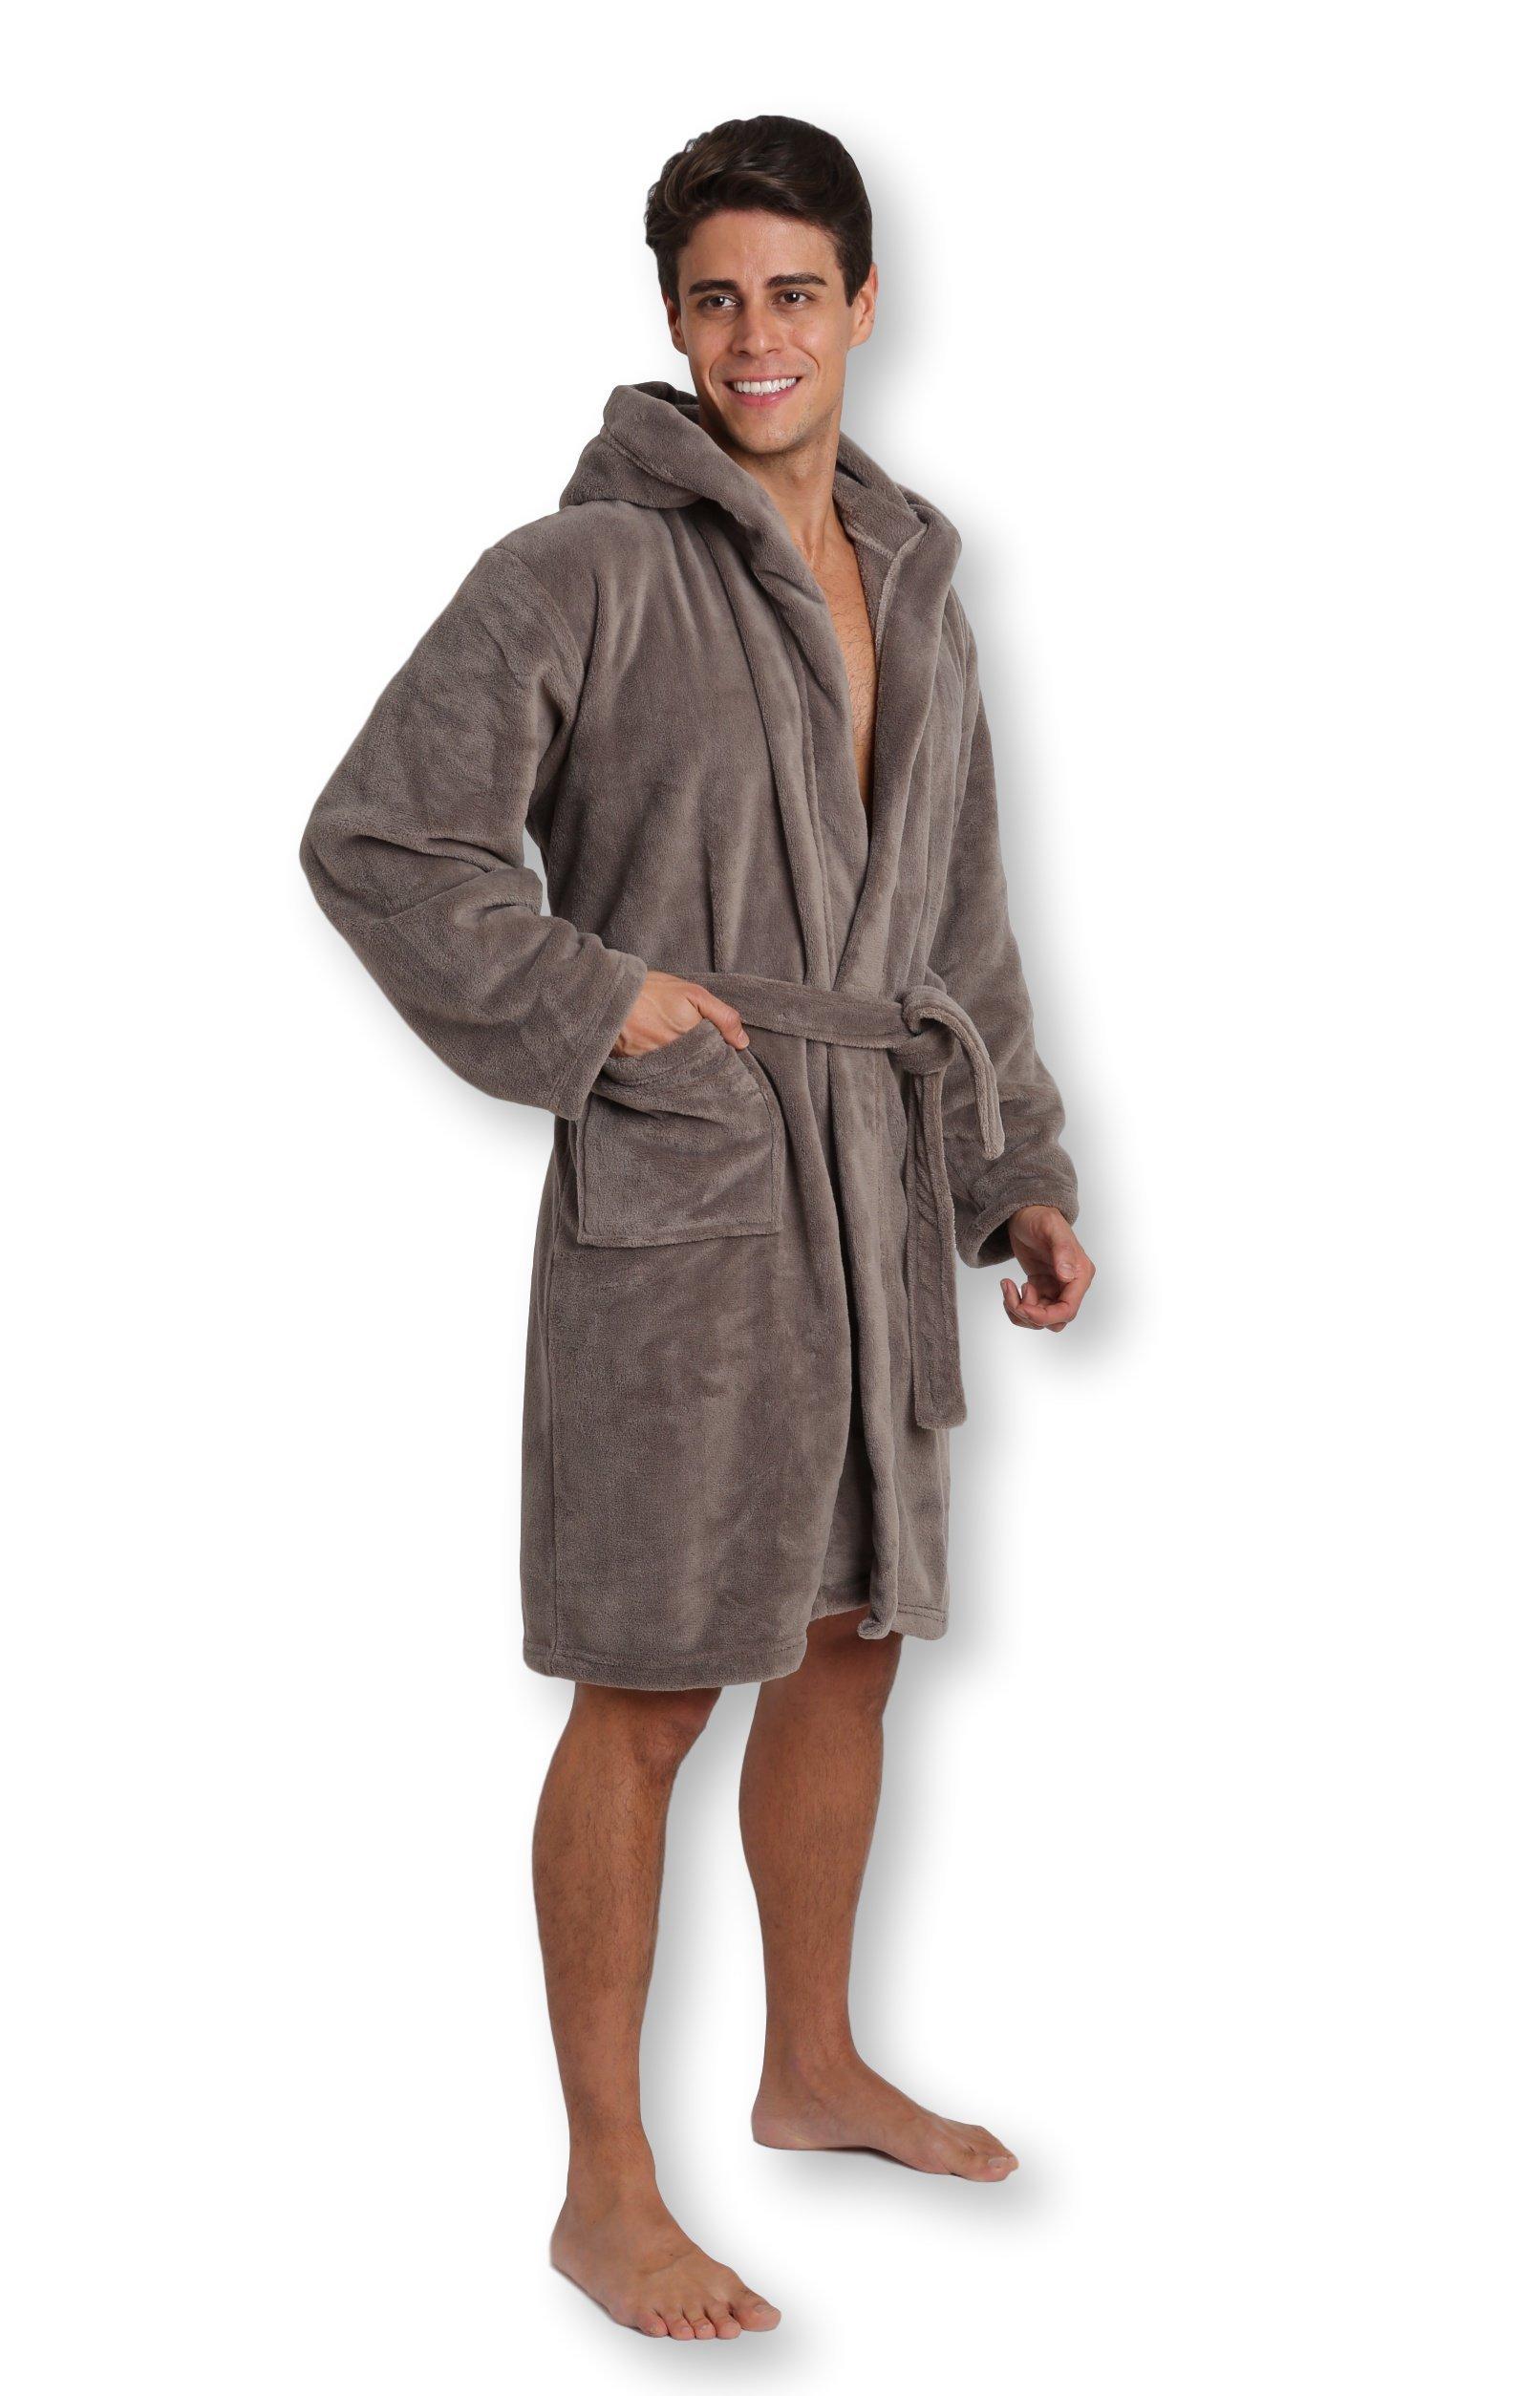 Pembrook Men's Robe with Hood – Gray - Size L/XL - Soft Fleece – Hotel Spa Bathrobe